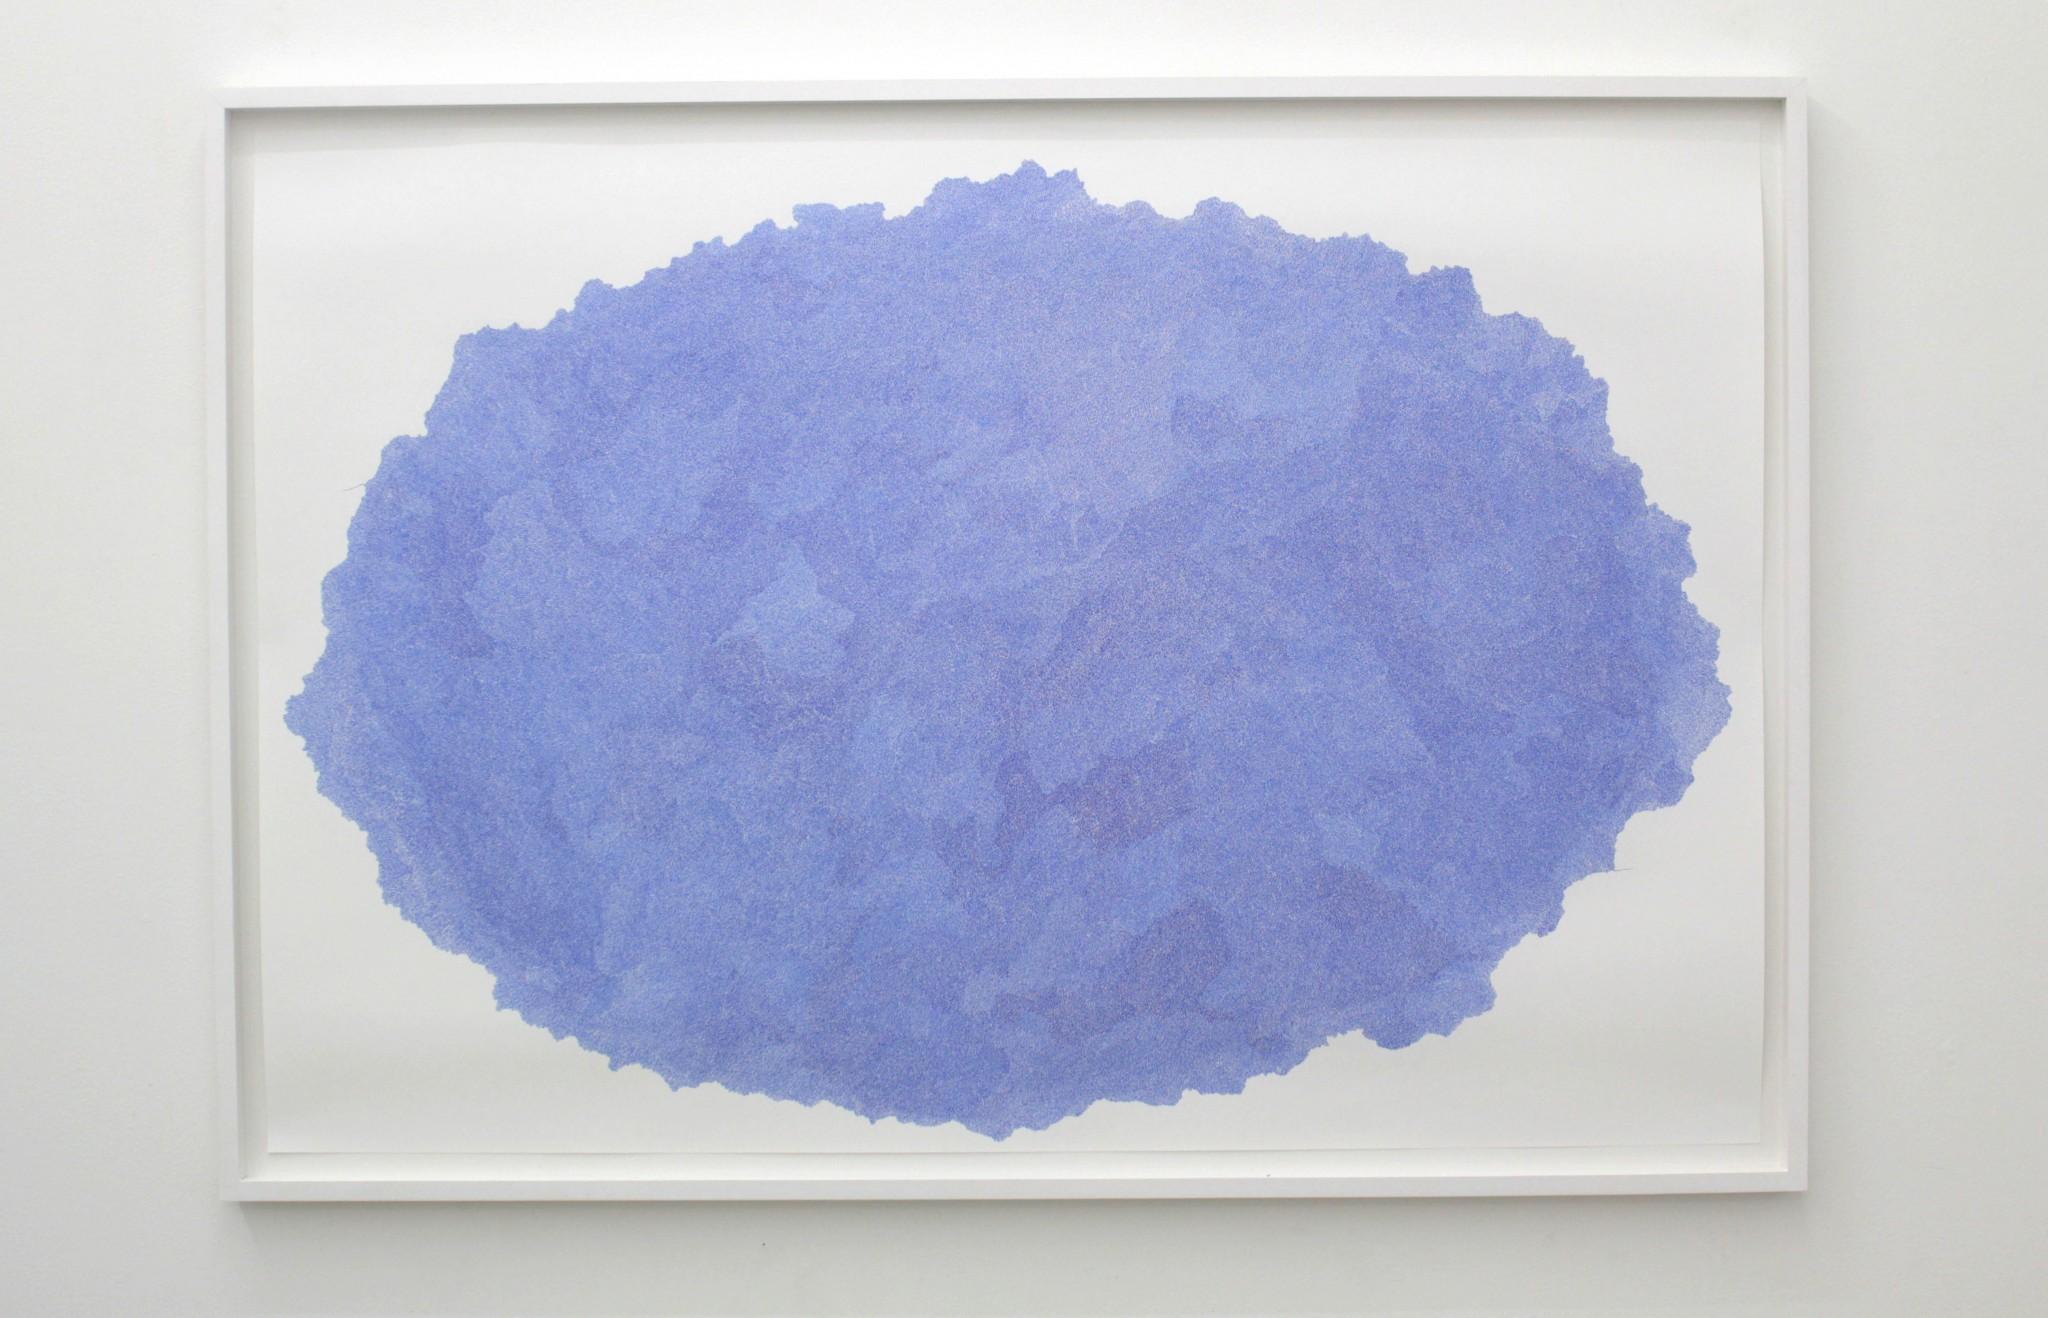 Timescale, 75x110 cm, 2018, Material tusch på papper